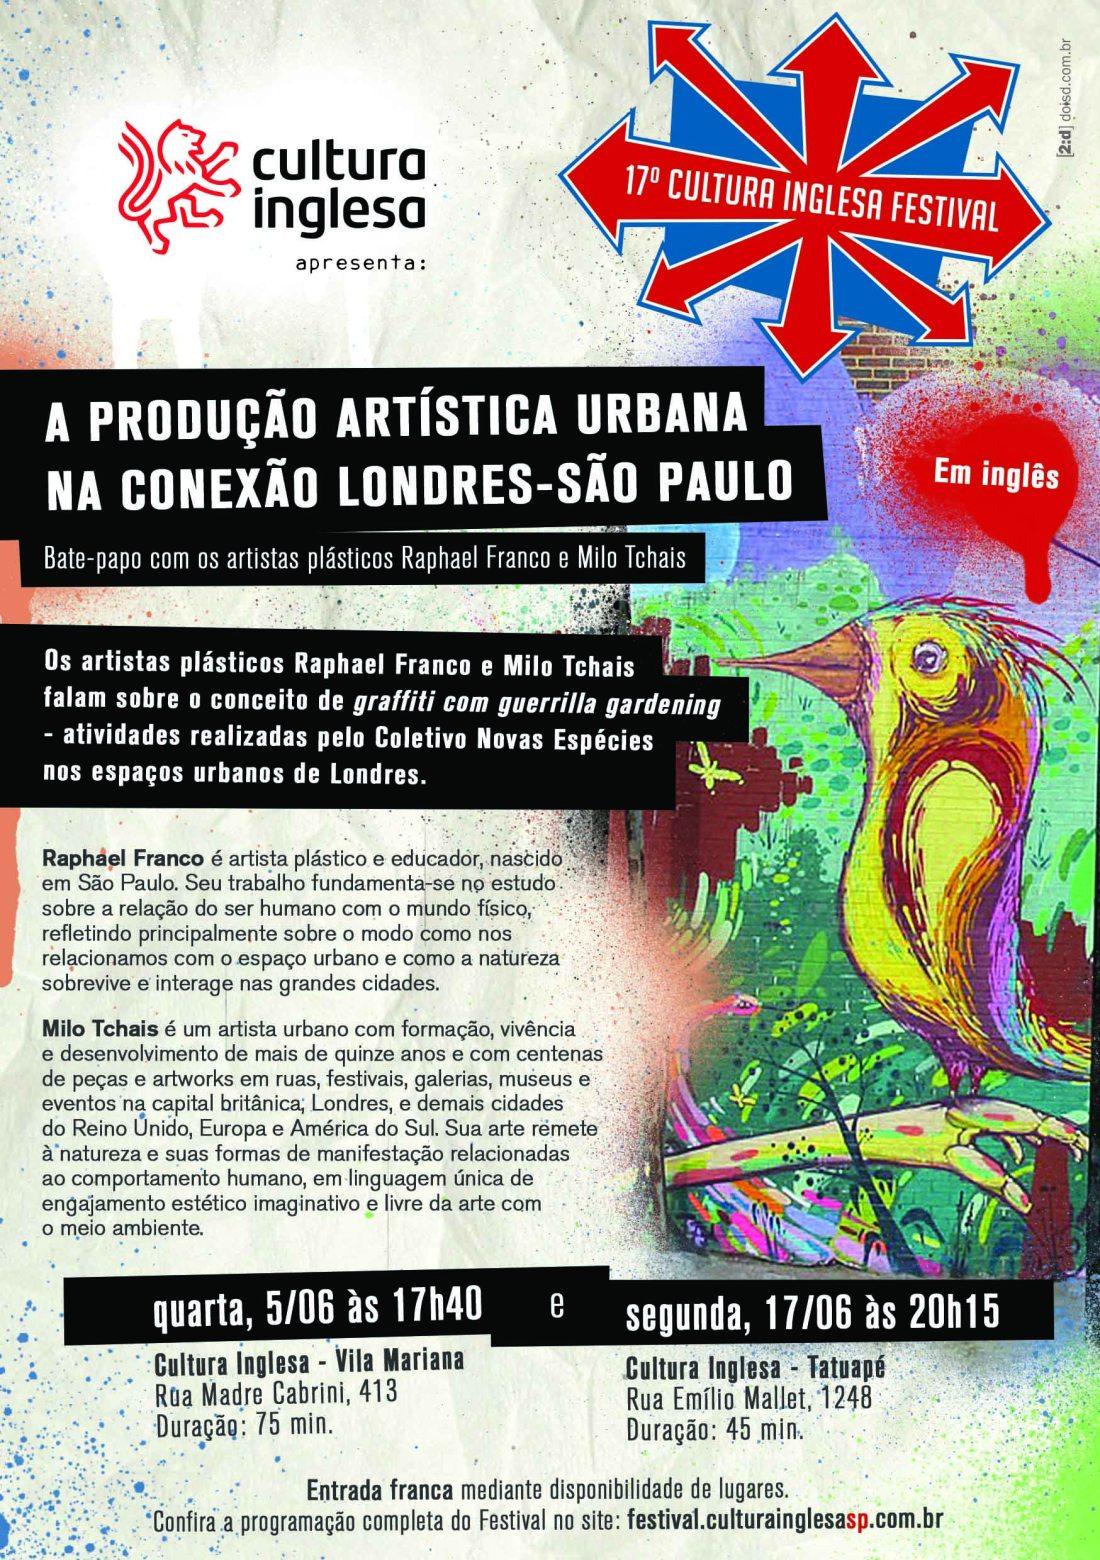 Coletivo Novas Espécies no Cultura Inglesa Festival 2013!